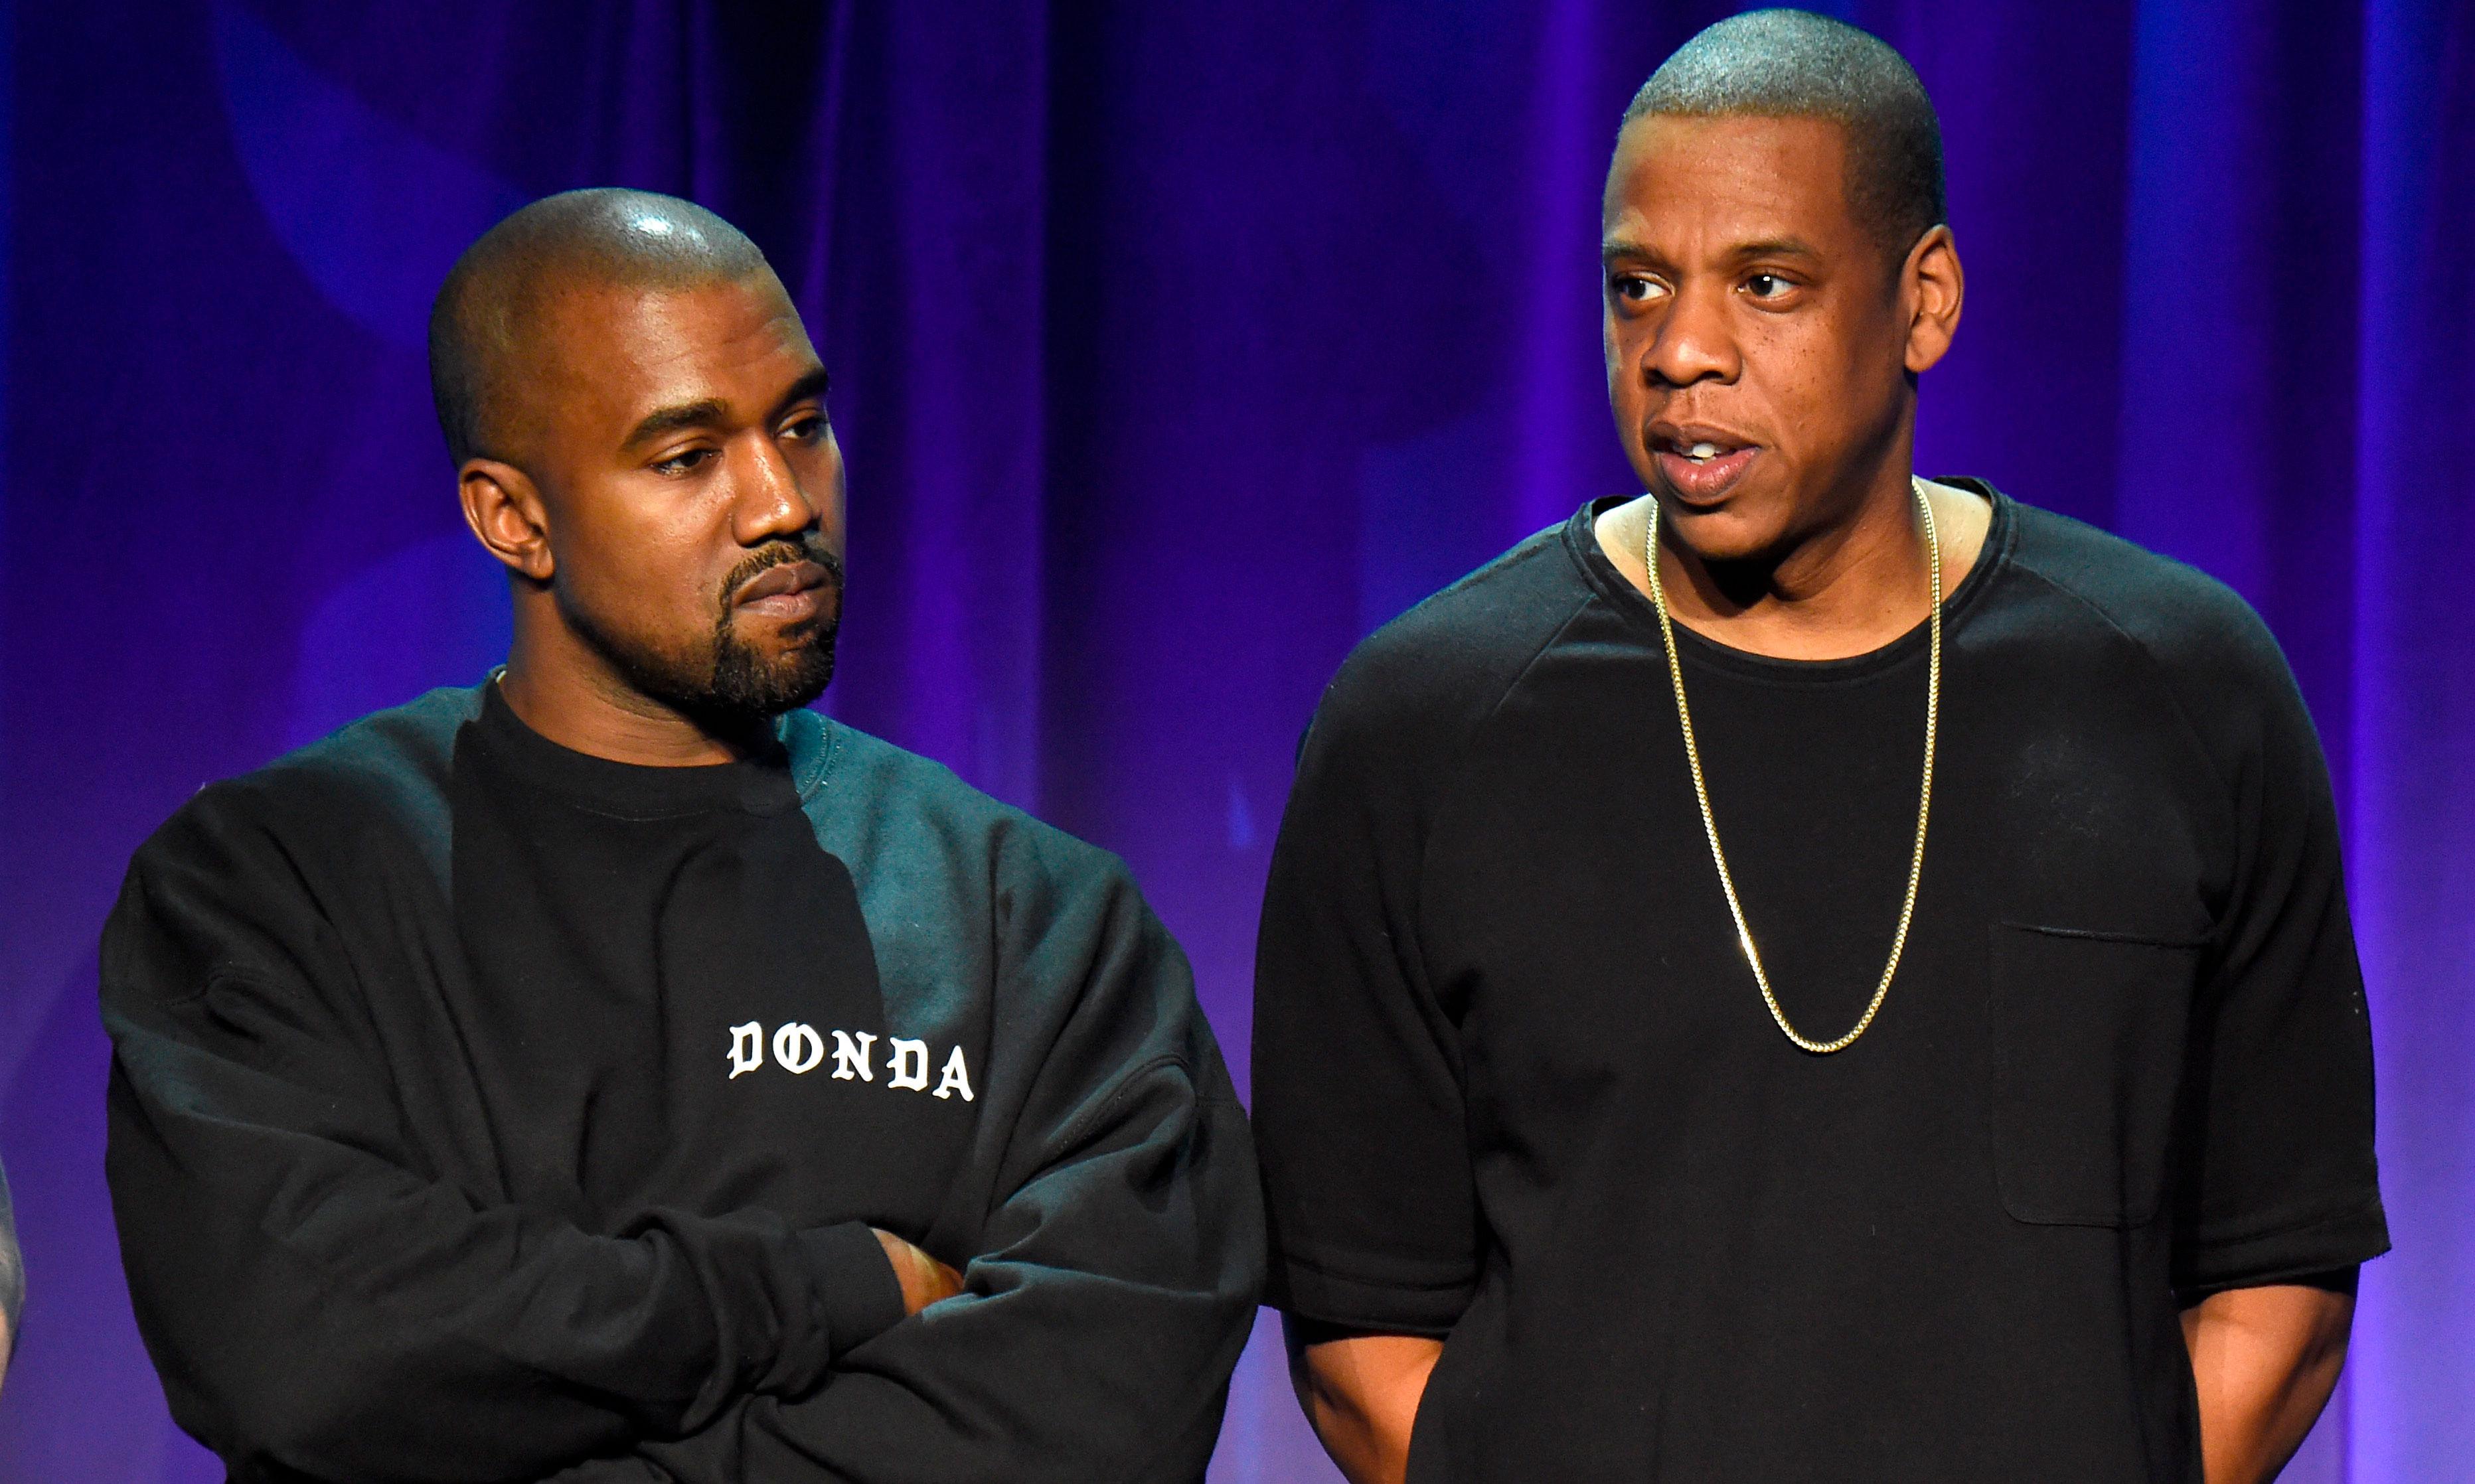 Kanye West 正式与音乐平台 Tidal 解约